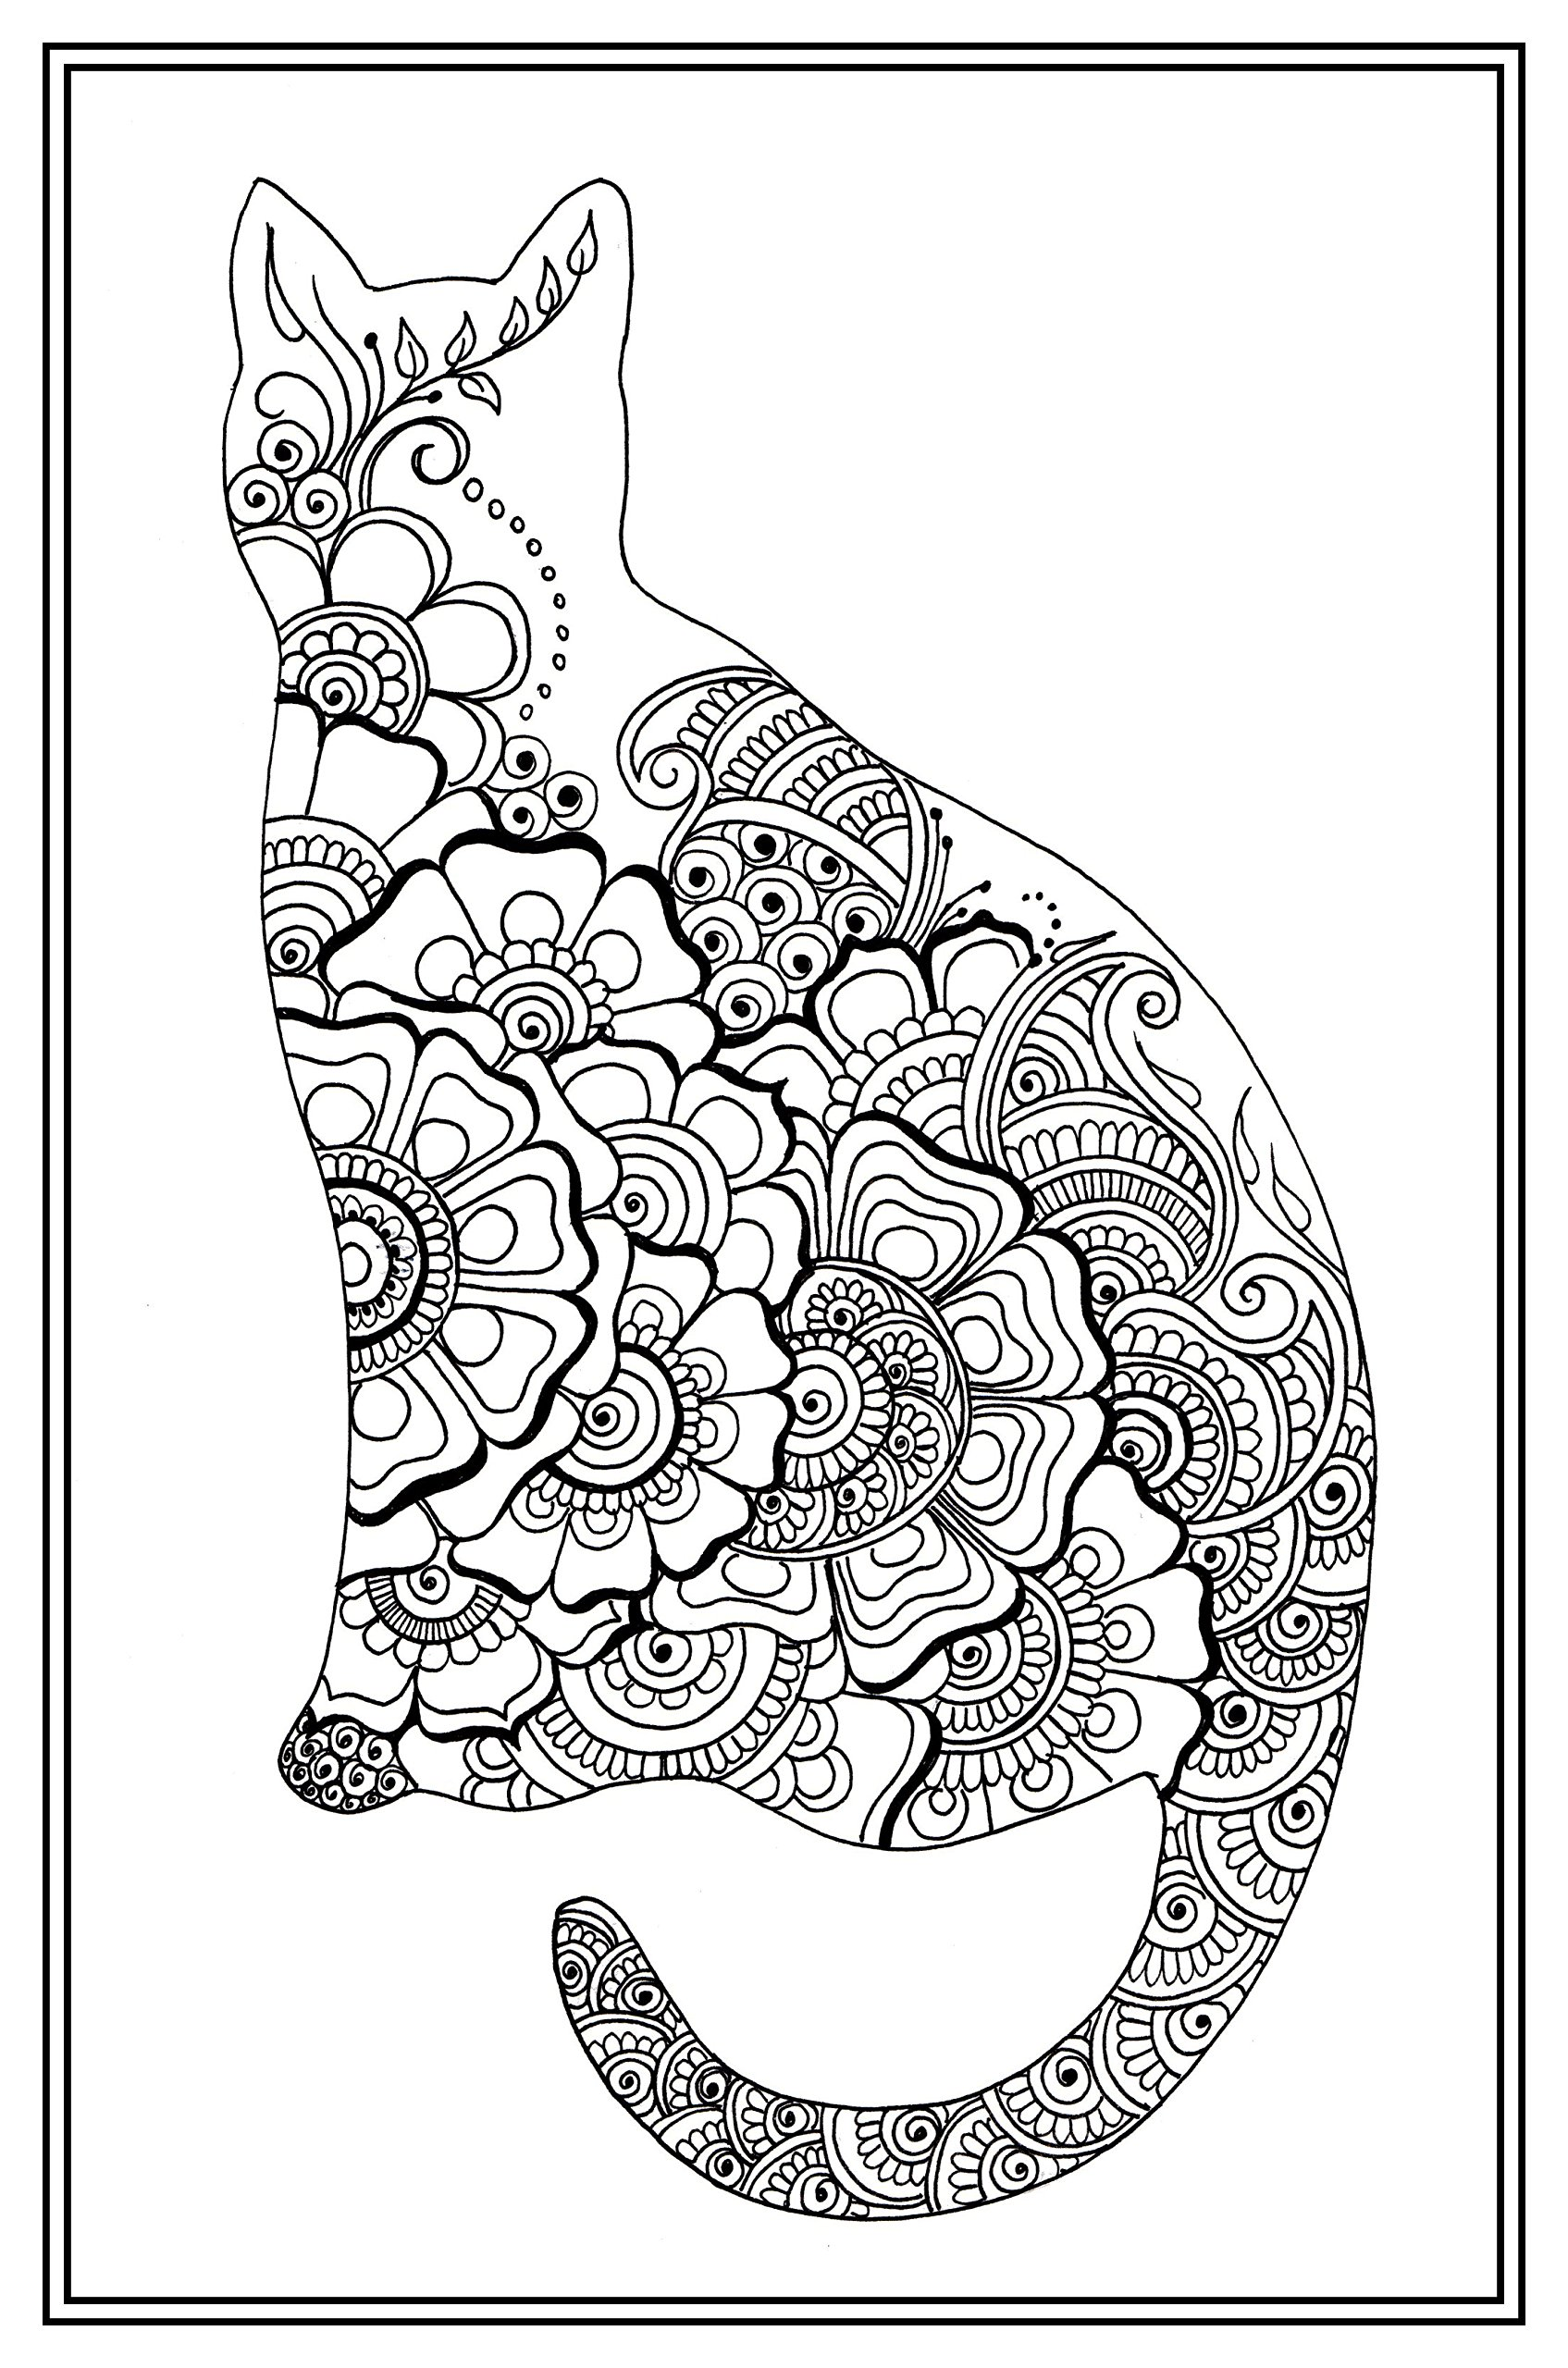 Zen colouring in book - The Green Lady S Zen Henna Colouring Book Gwen Davies 0700461593140 Amazon Com Books